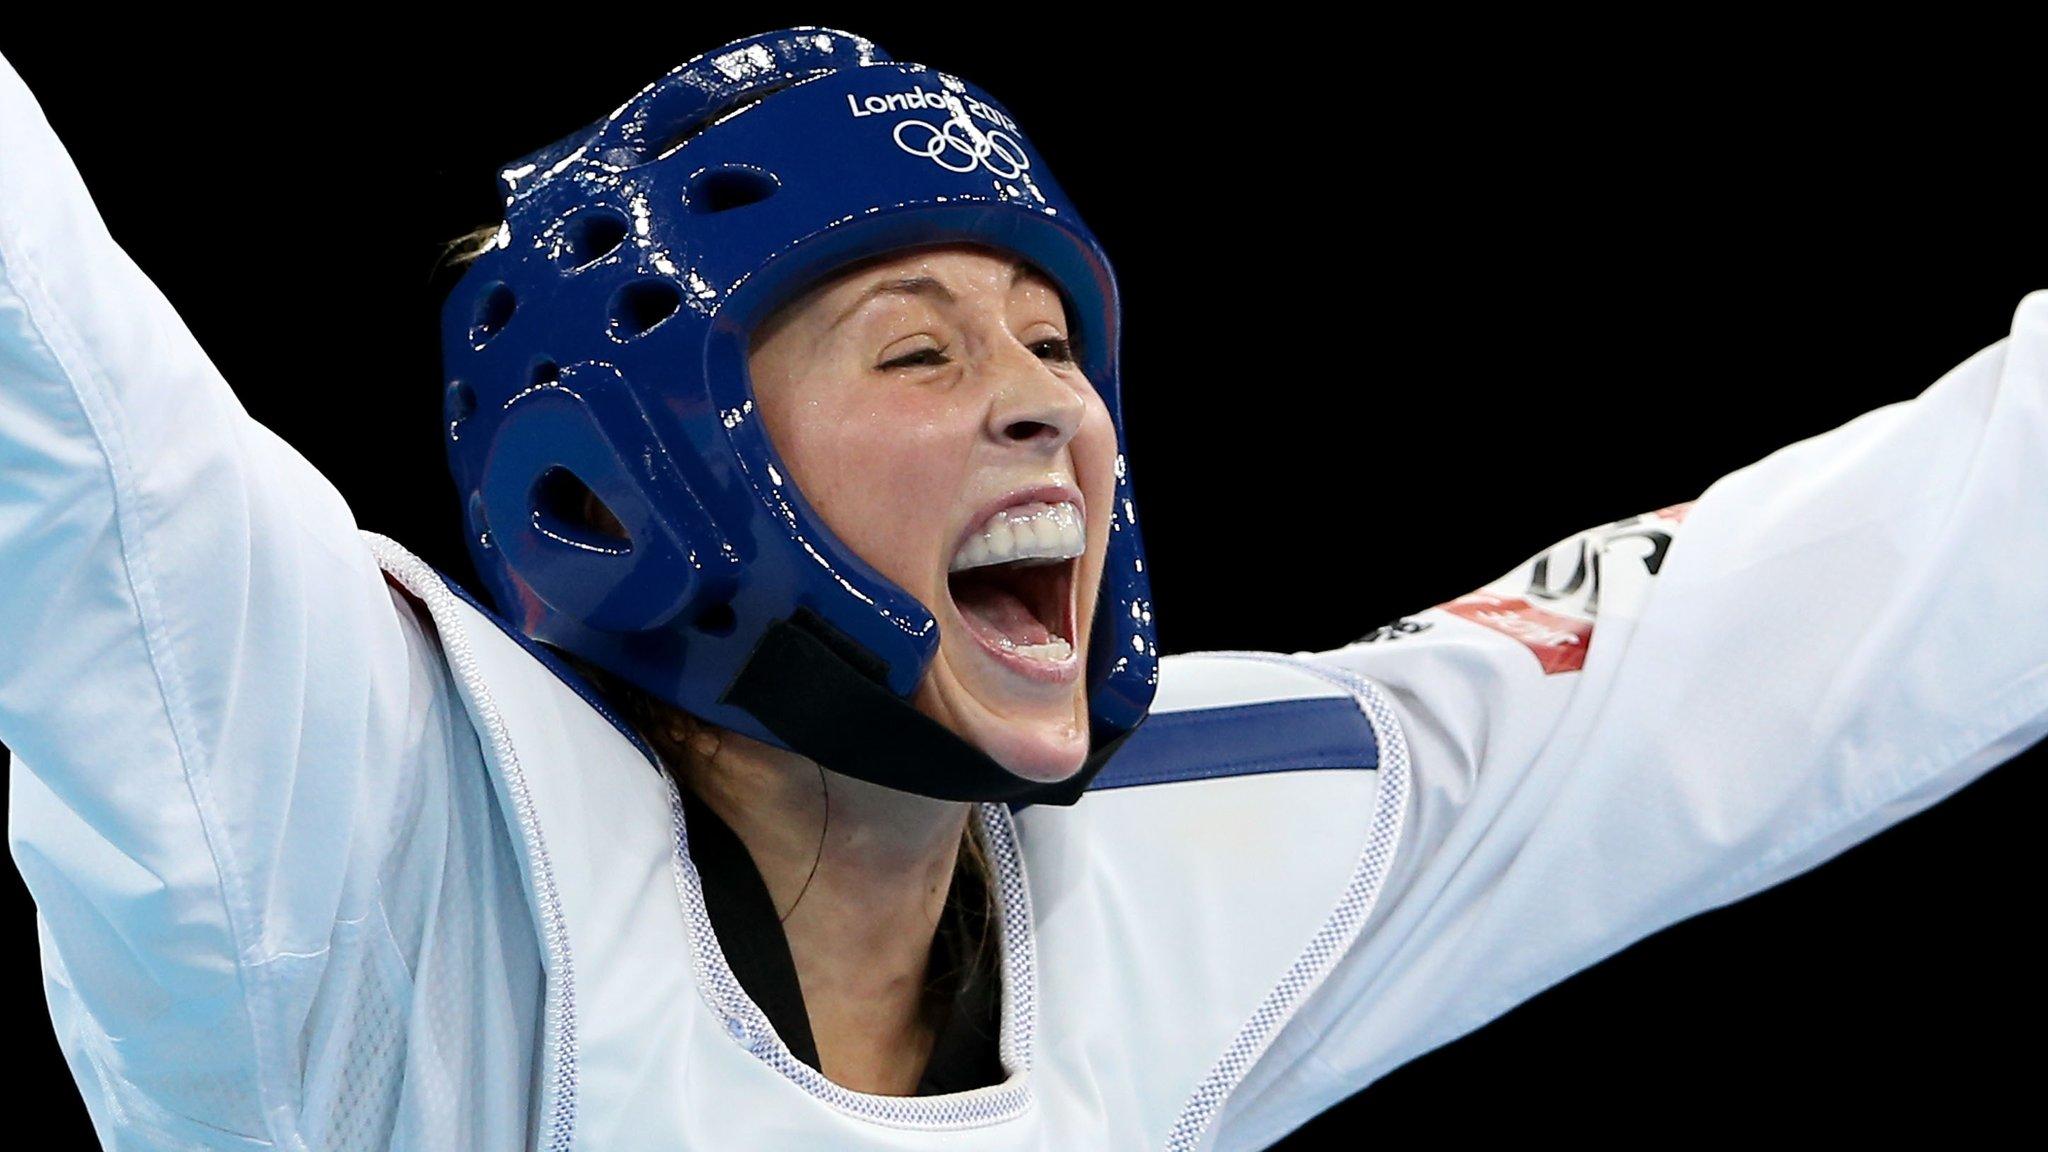 Jade Jones: Olympic taekwondo champion may continue after Tokyo 2020